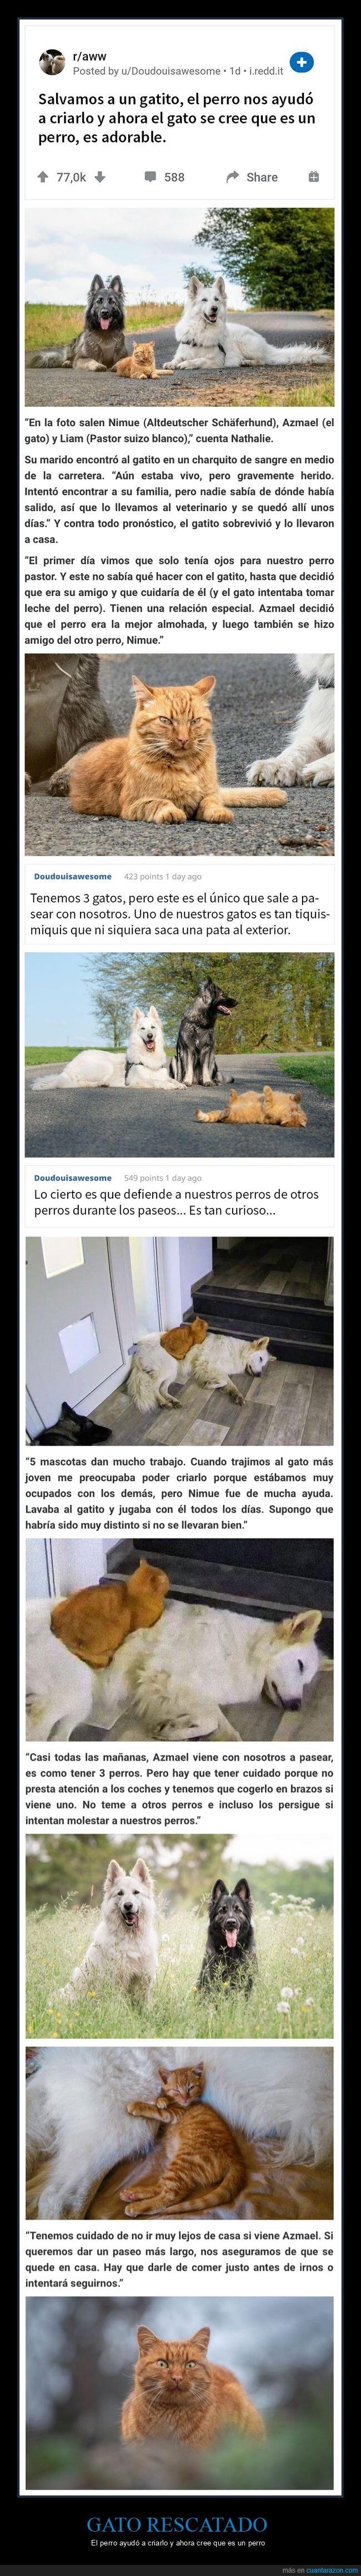 gato,perro,rescatado